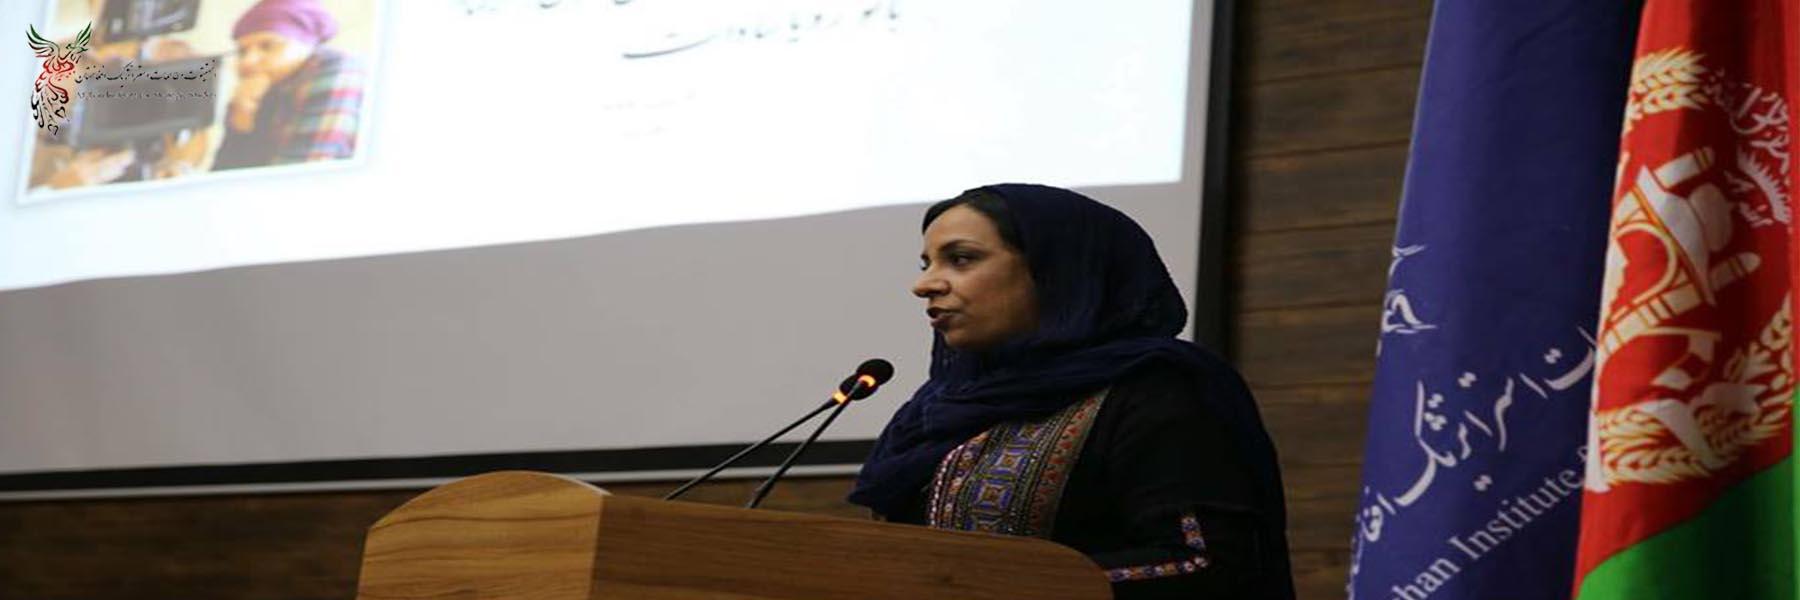 Honoring Roya Sadat's Activities and Achievements